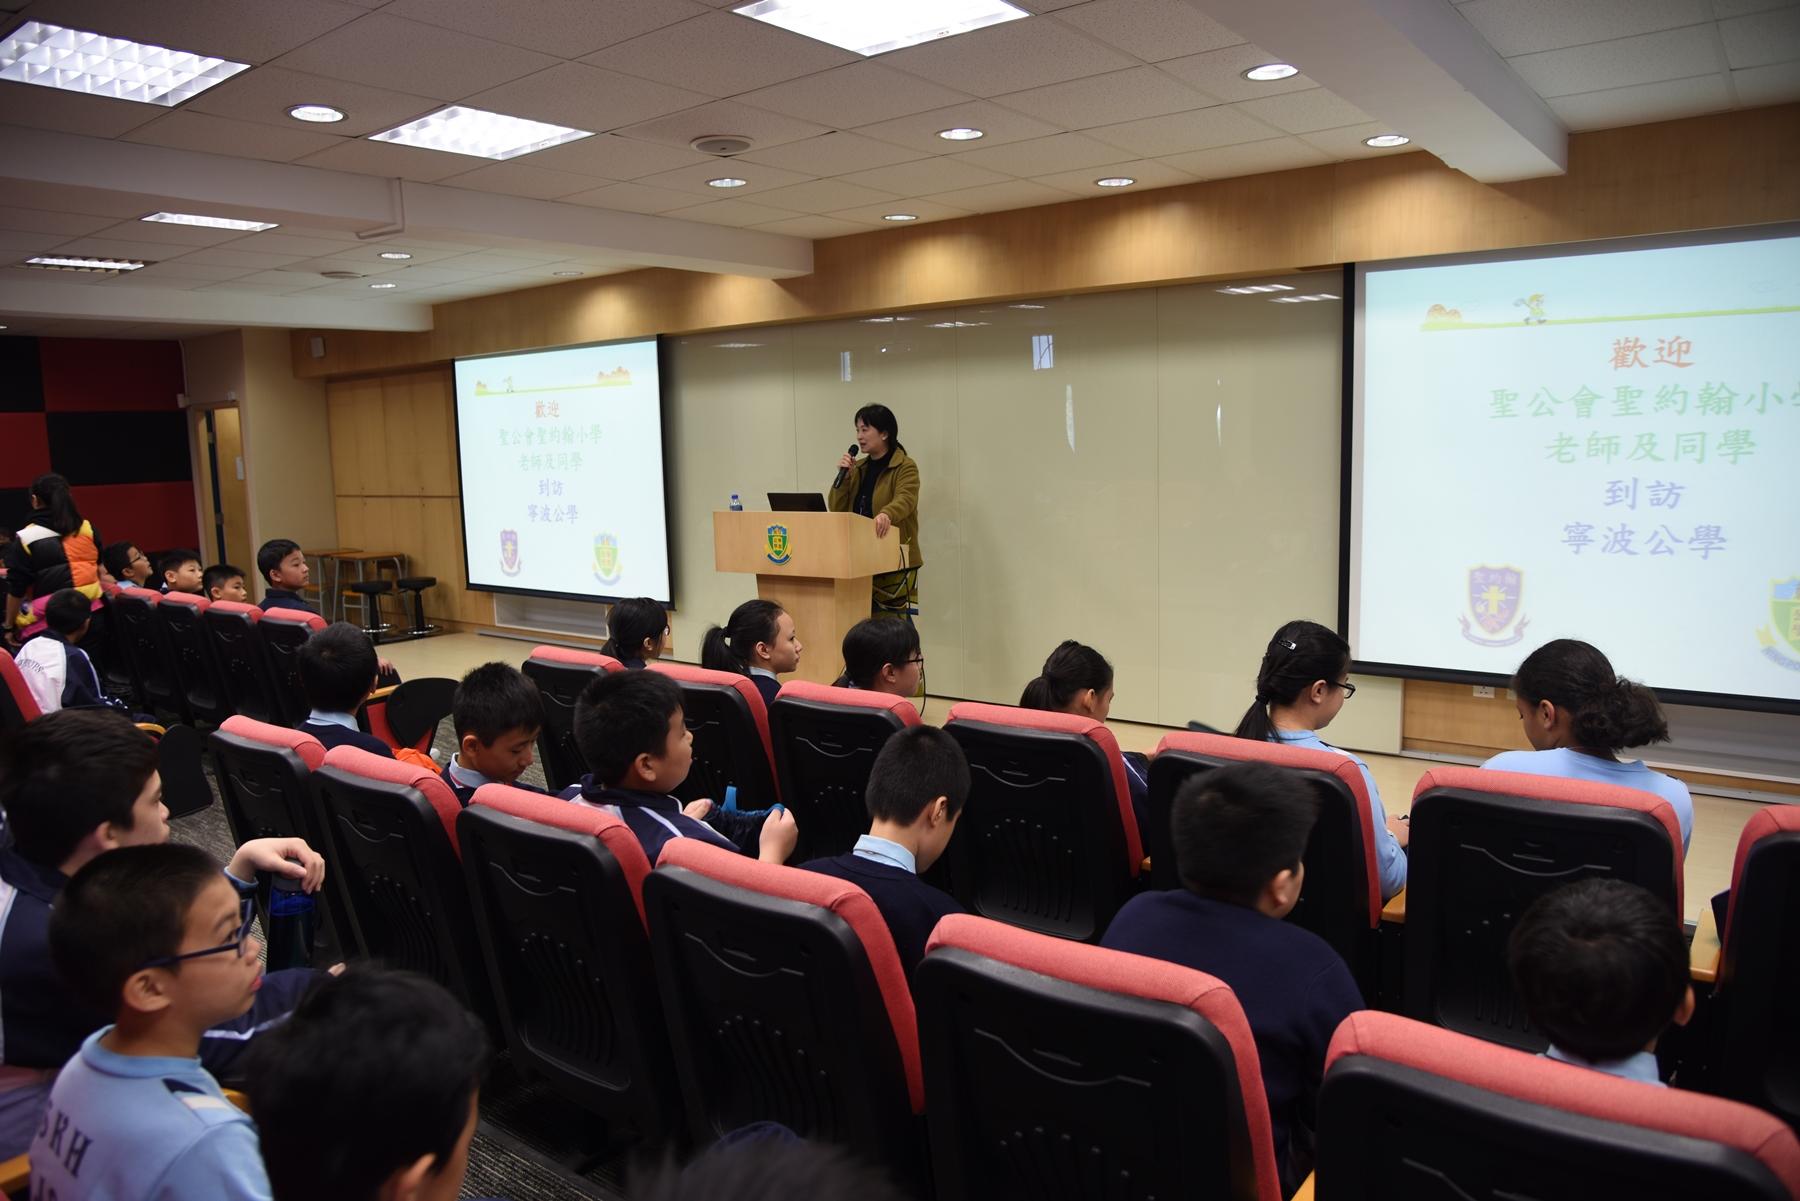 http://npc.edu.hk/sites/default/files/dsc_5207.jpg